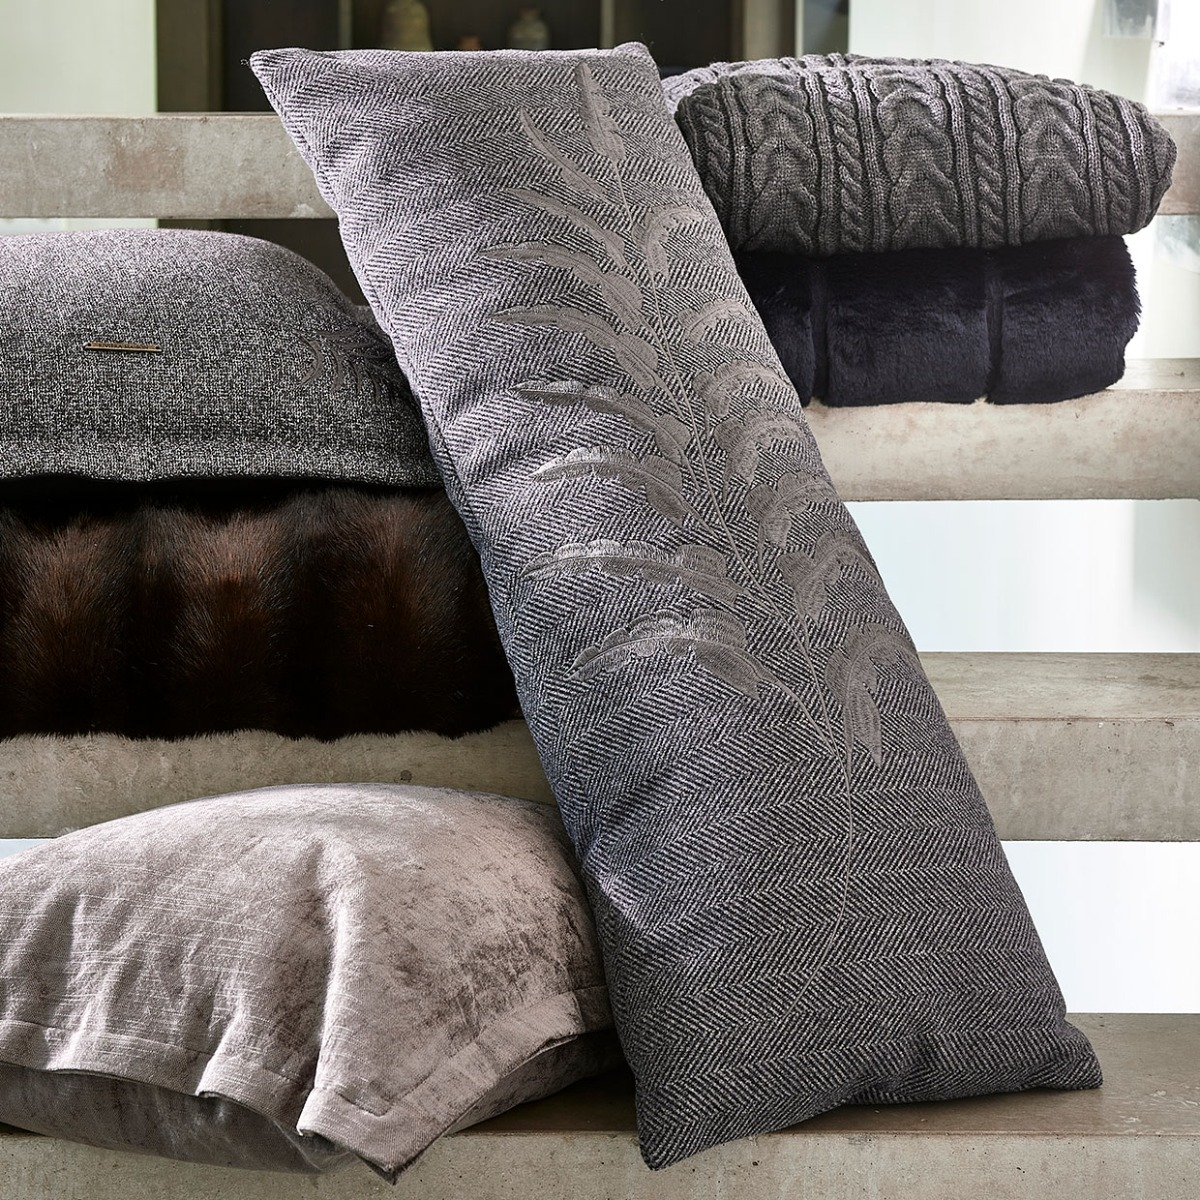 Winter Glamping Pillow's